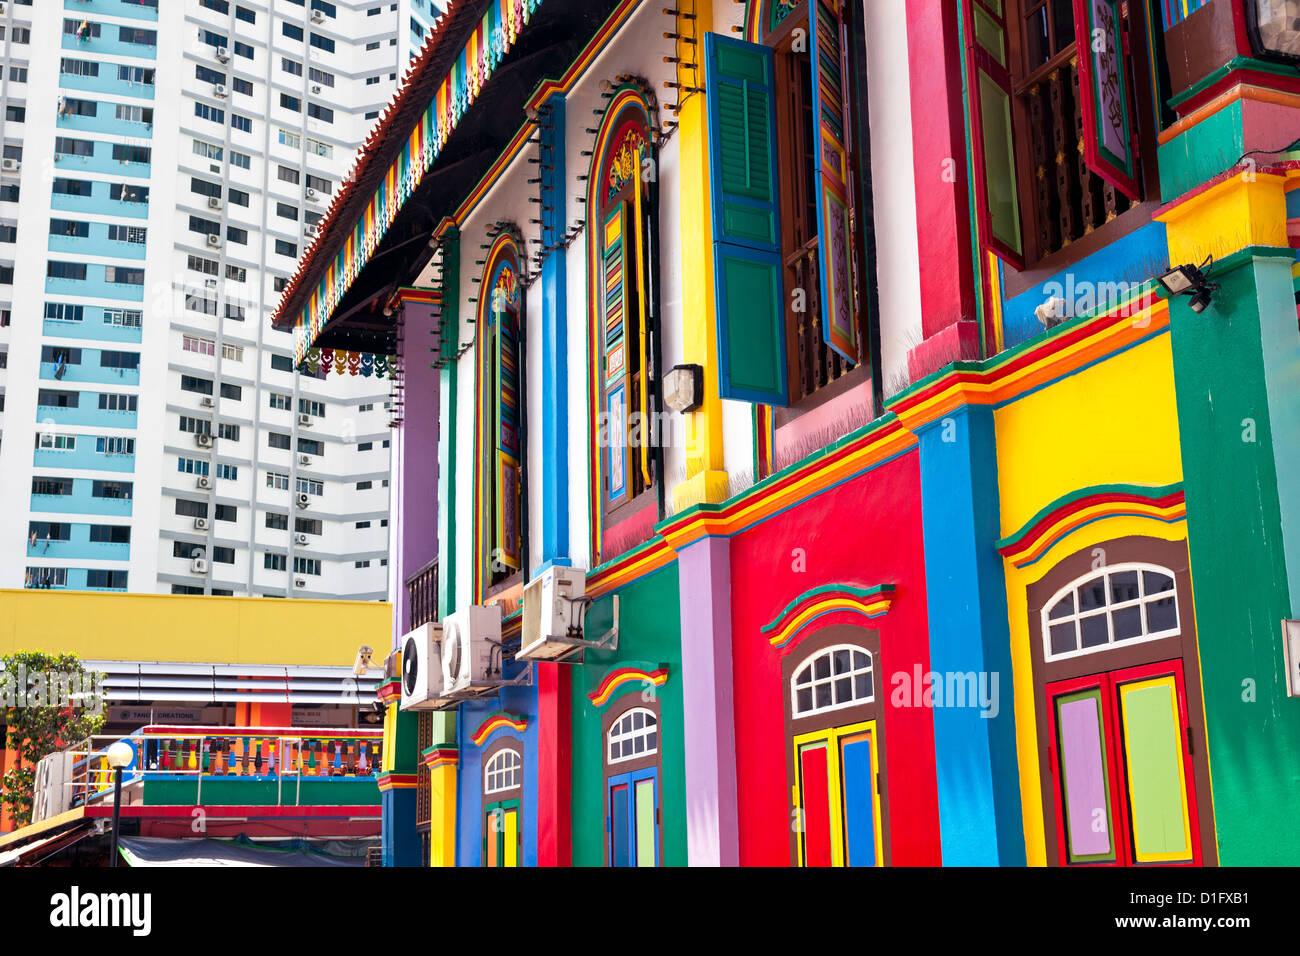 Bunte Erbe Villa, die Residenz des Tan Teng Niah, Little India, Singapur, Südostasien, Asien Stockbild